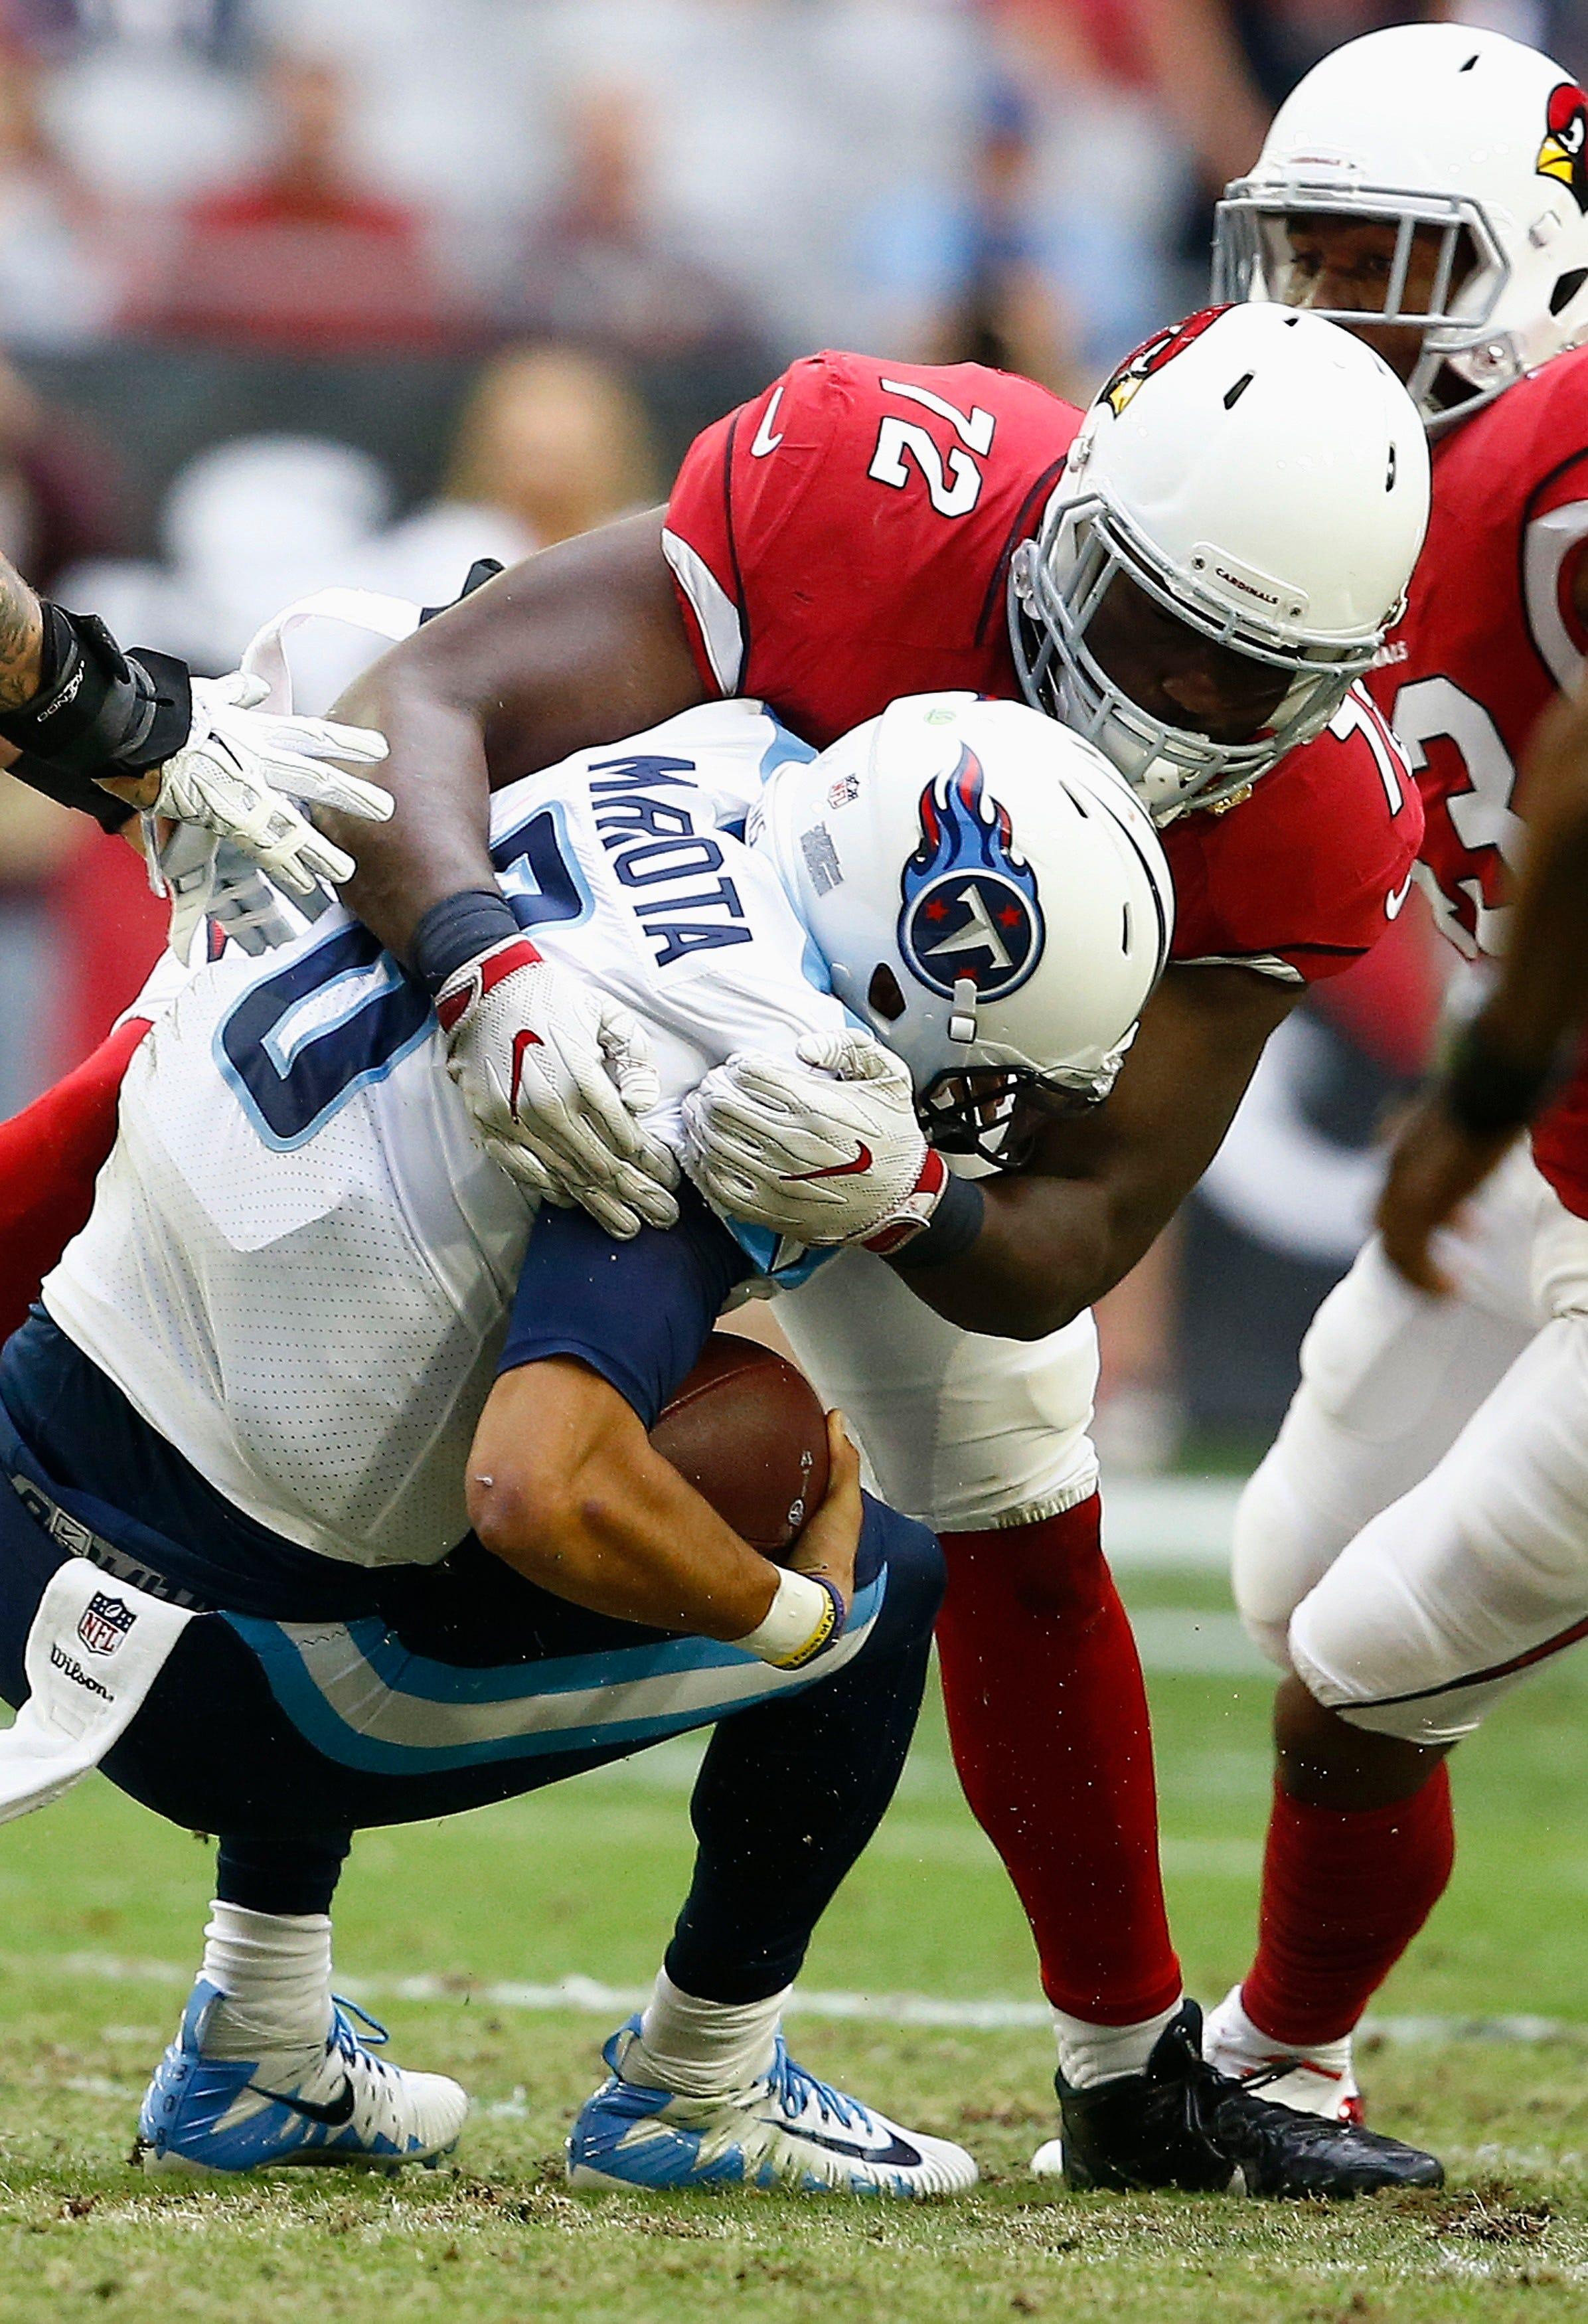 Mariota struggles in Titans' 12-7 loss to Cardinals